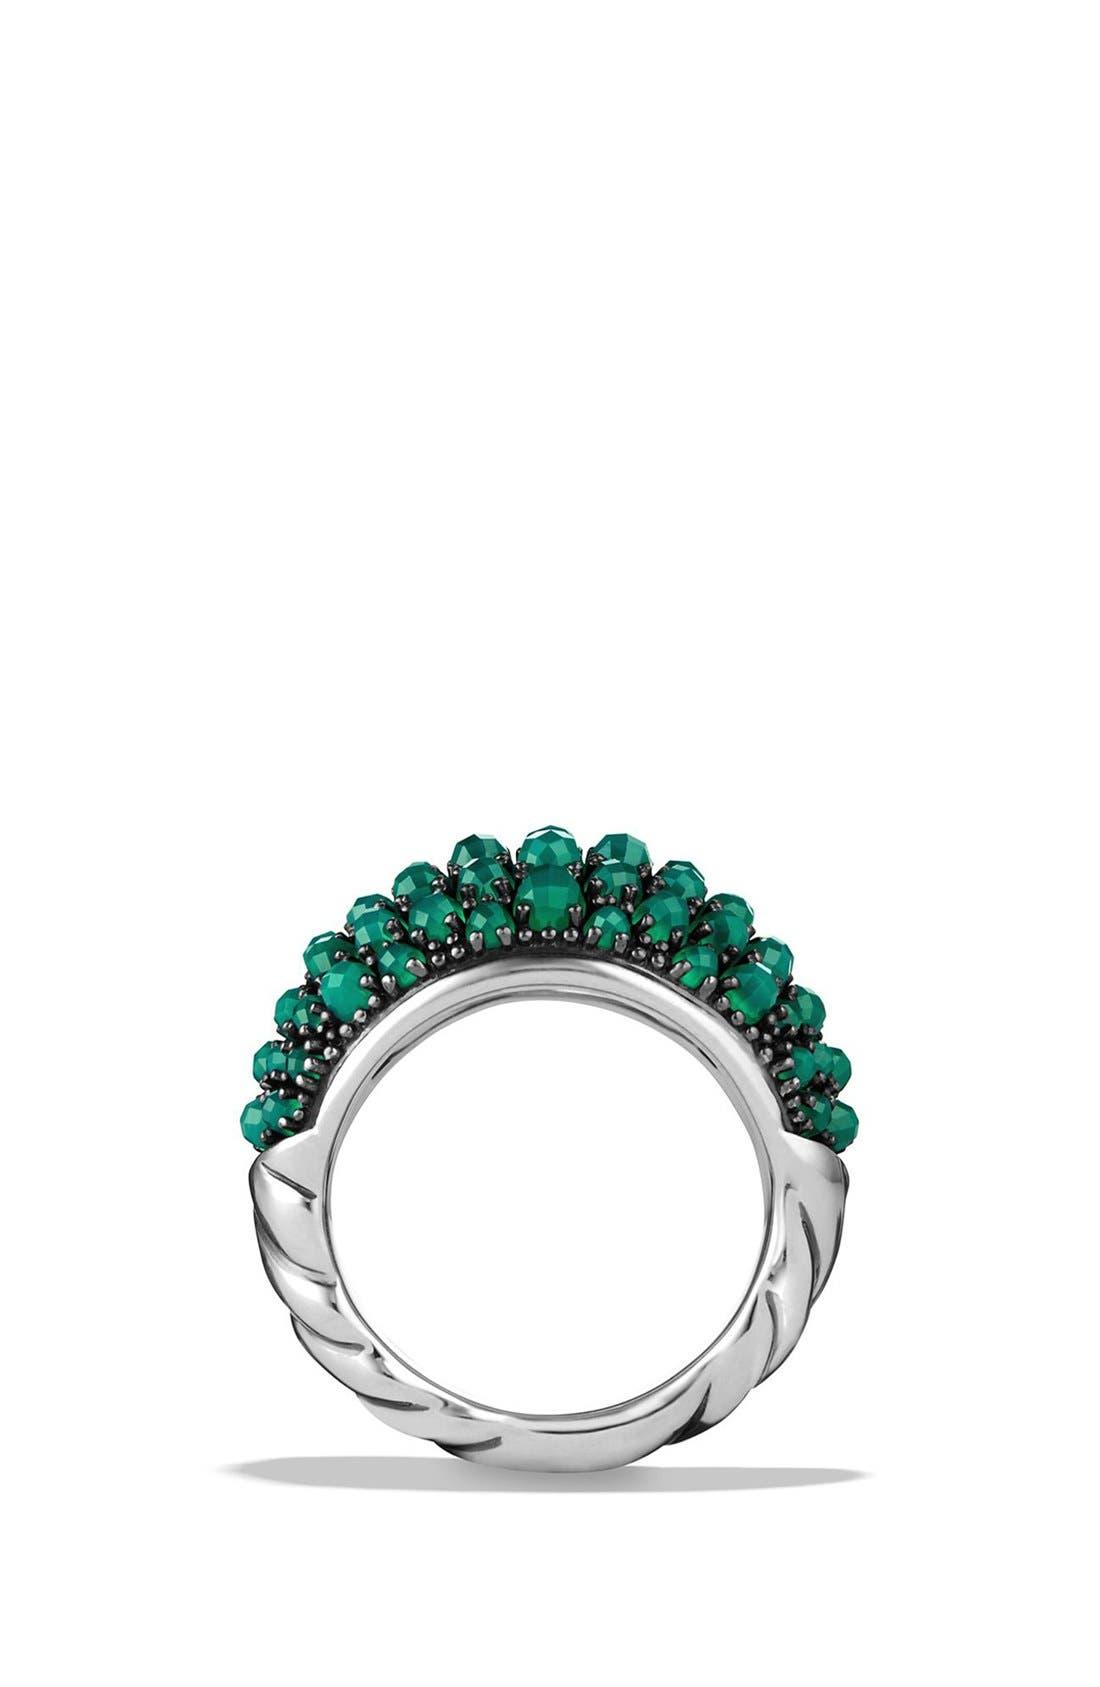 DAVID YURMAN,                             Cable Berries Dome Ring,                             Alternate thumbnail 2, color,                             300